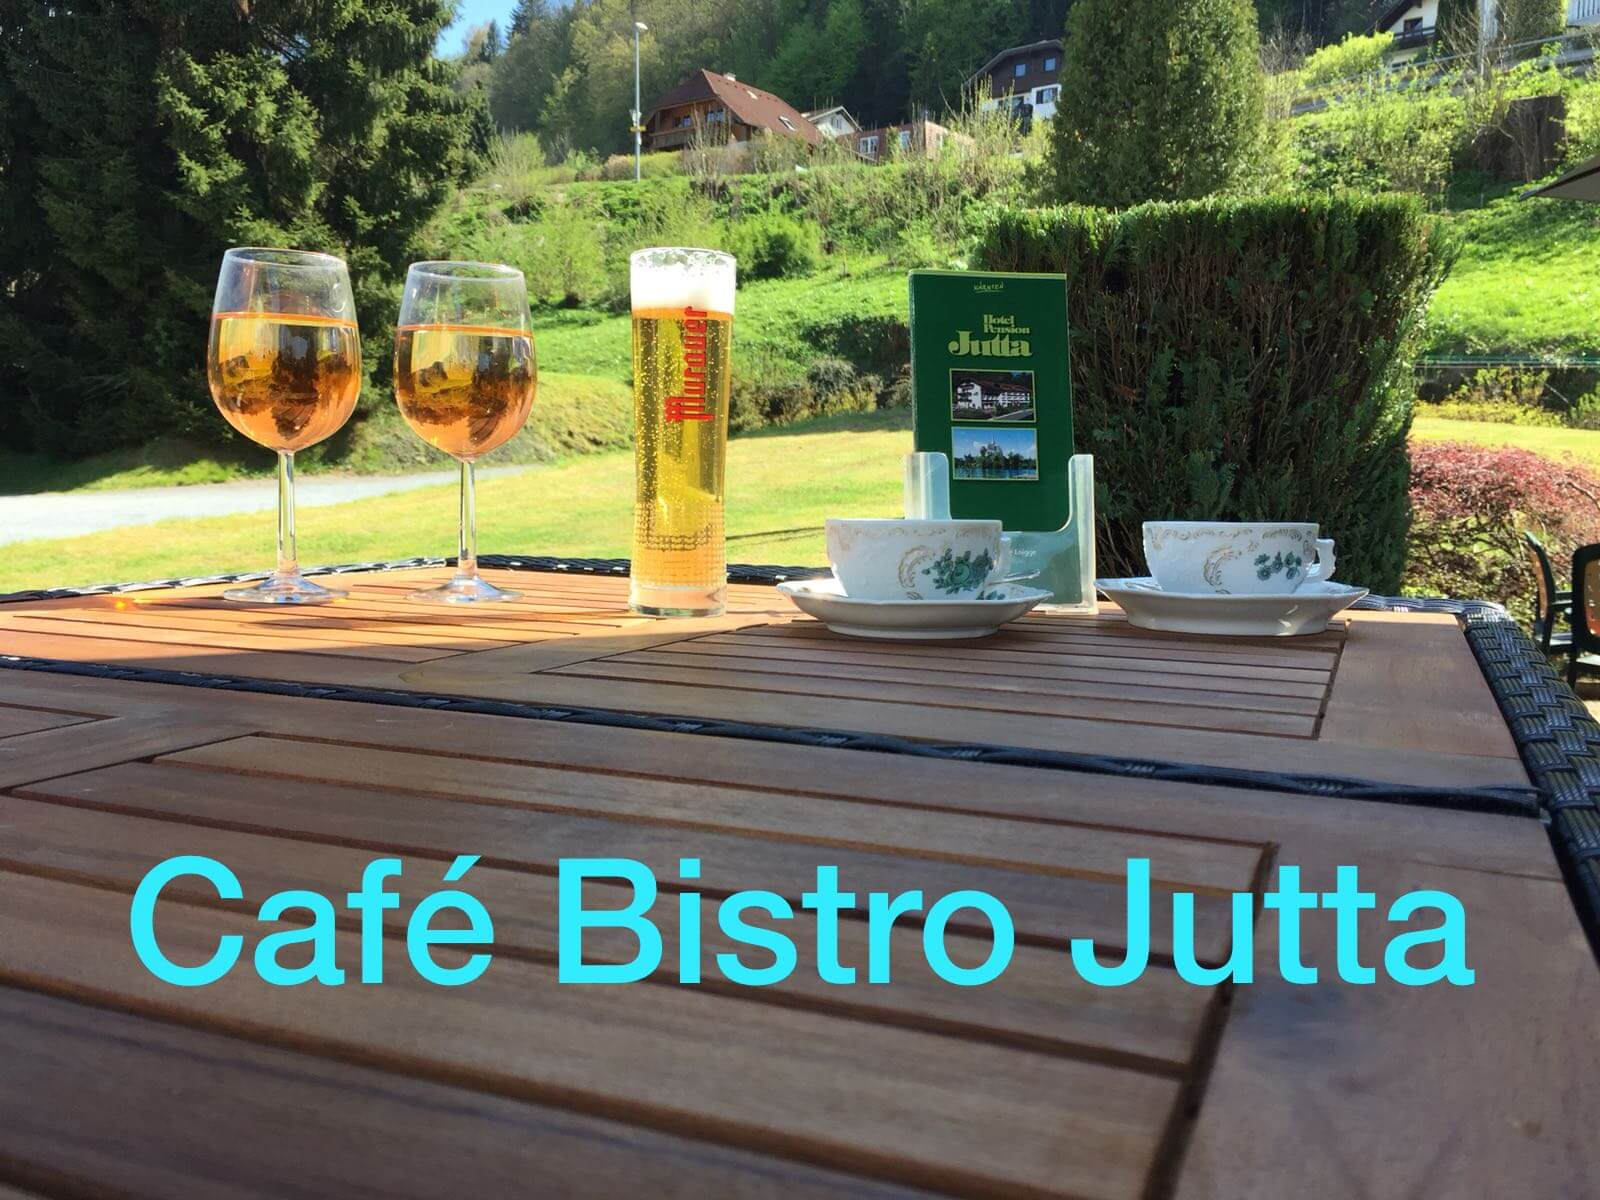 Cafe Bistro Jutta